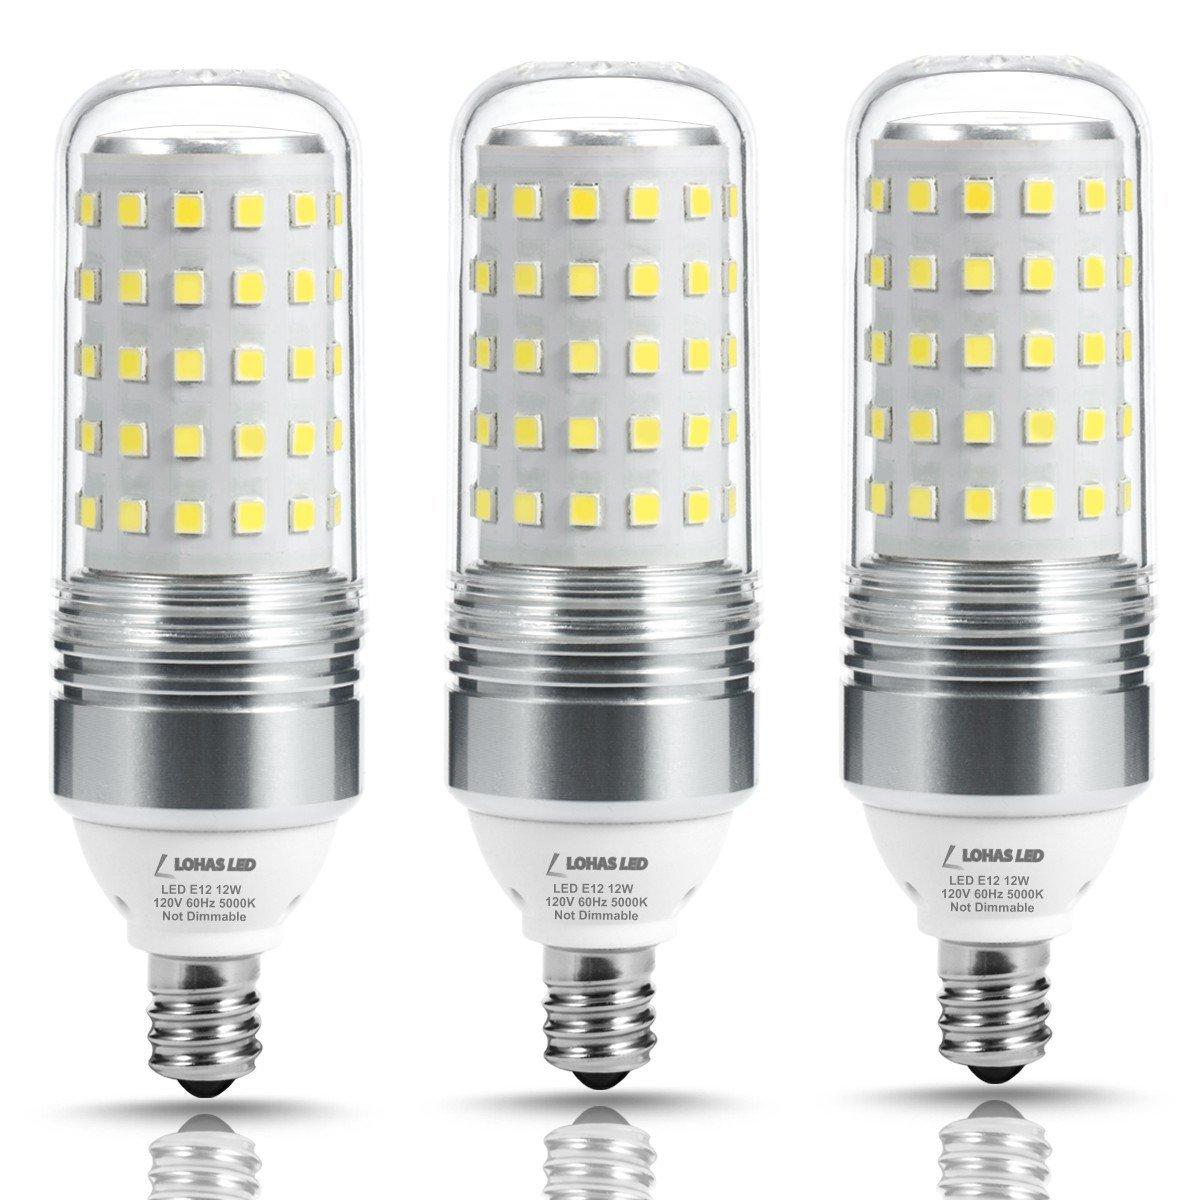 Led Light Bulb Equivalent 100w Incandescent